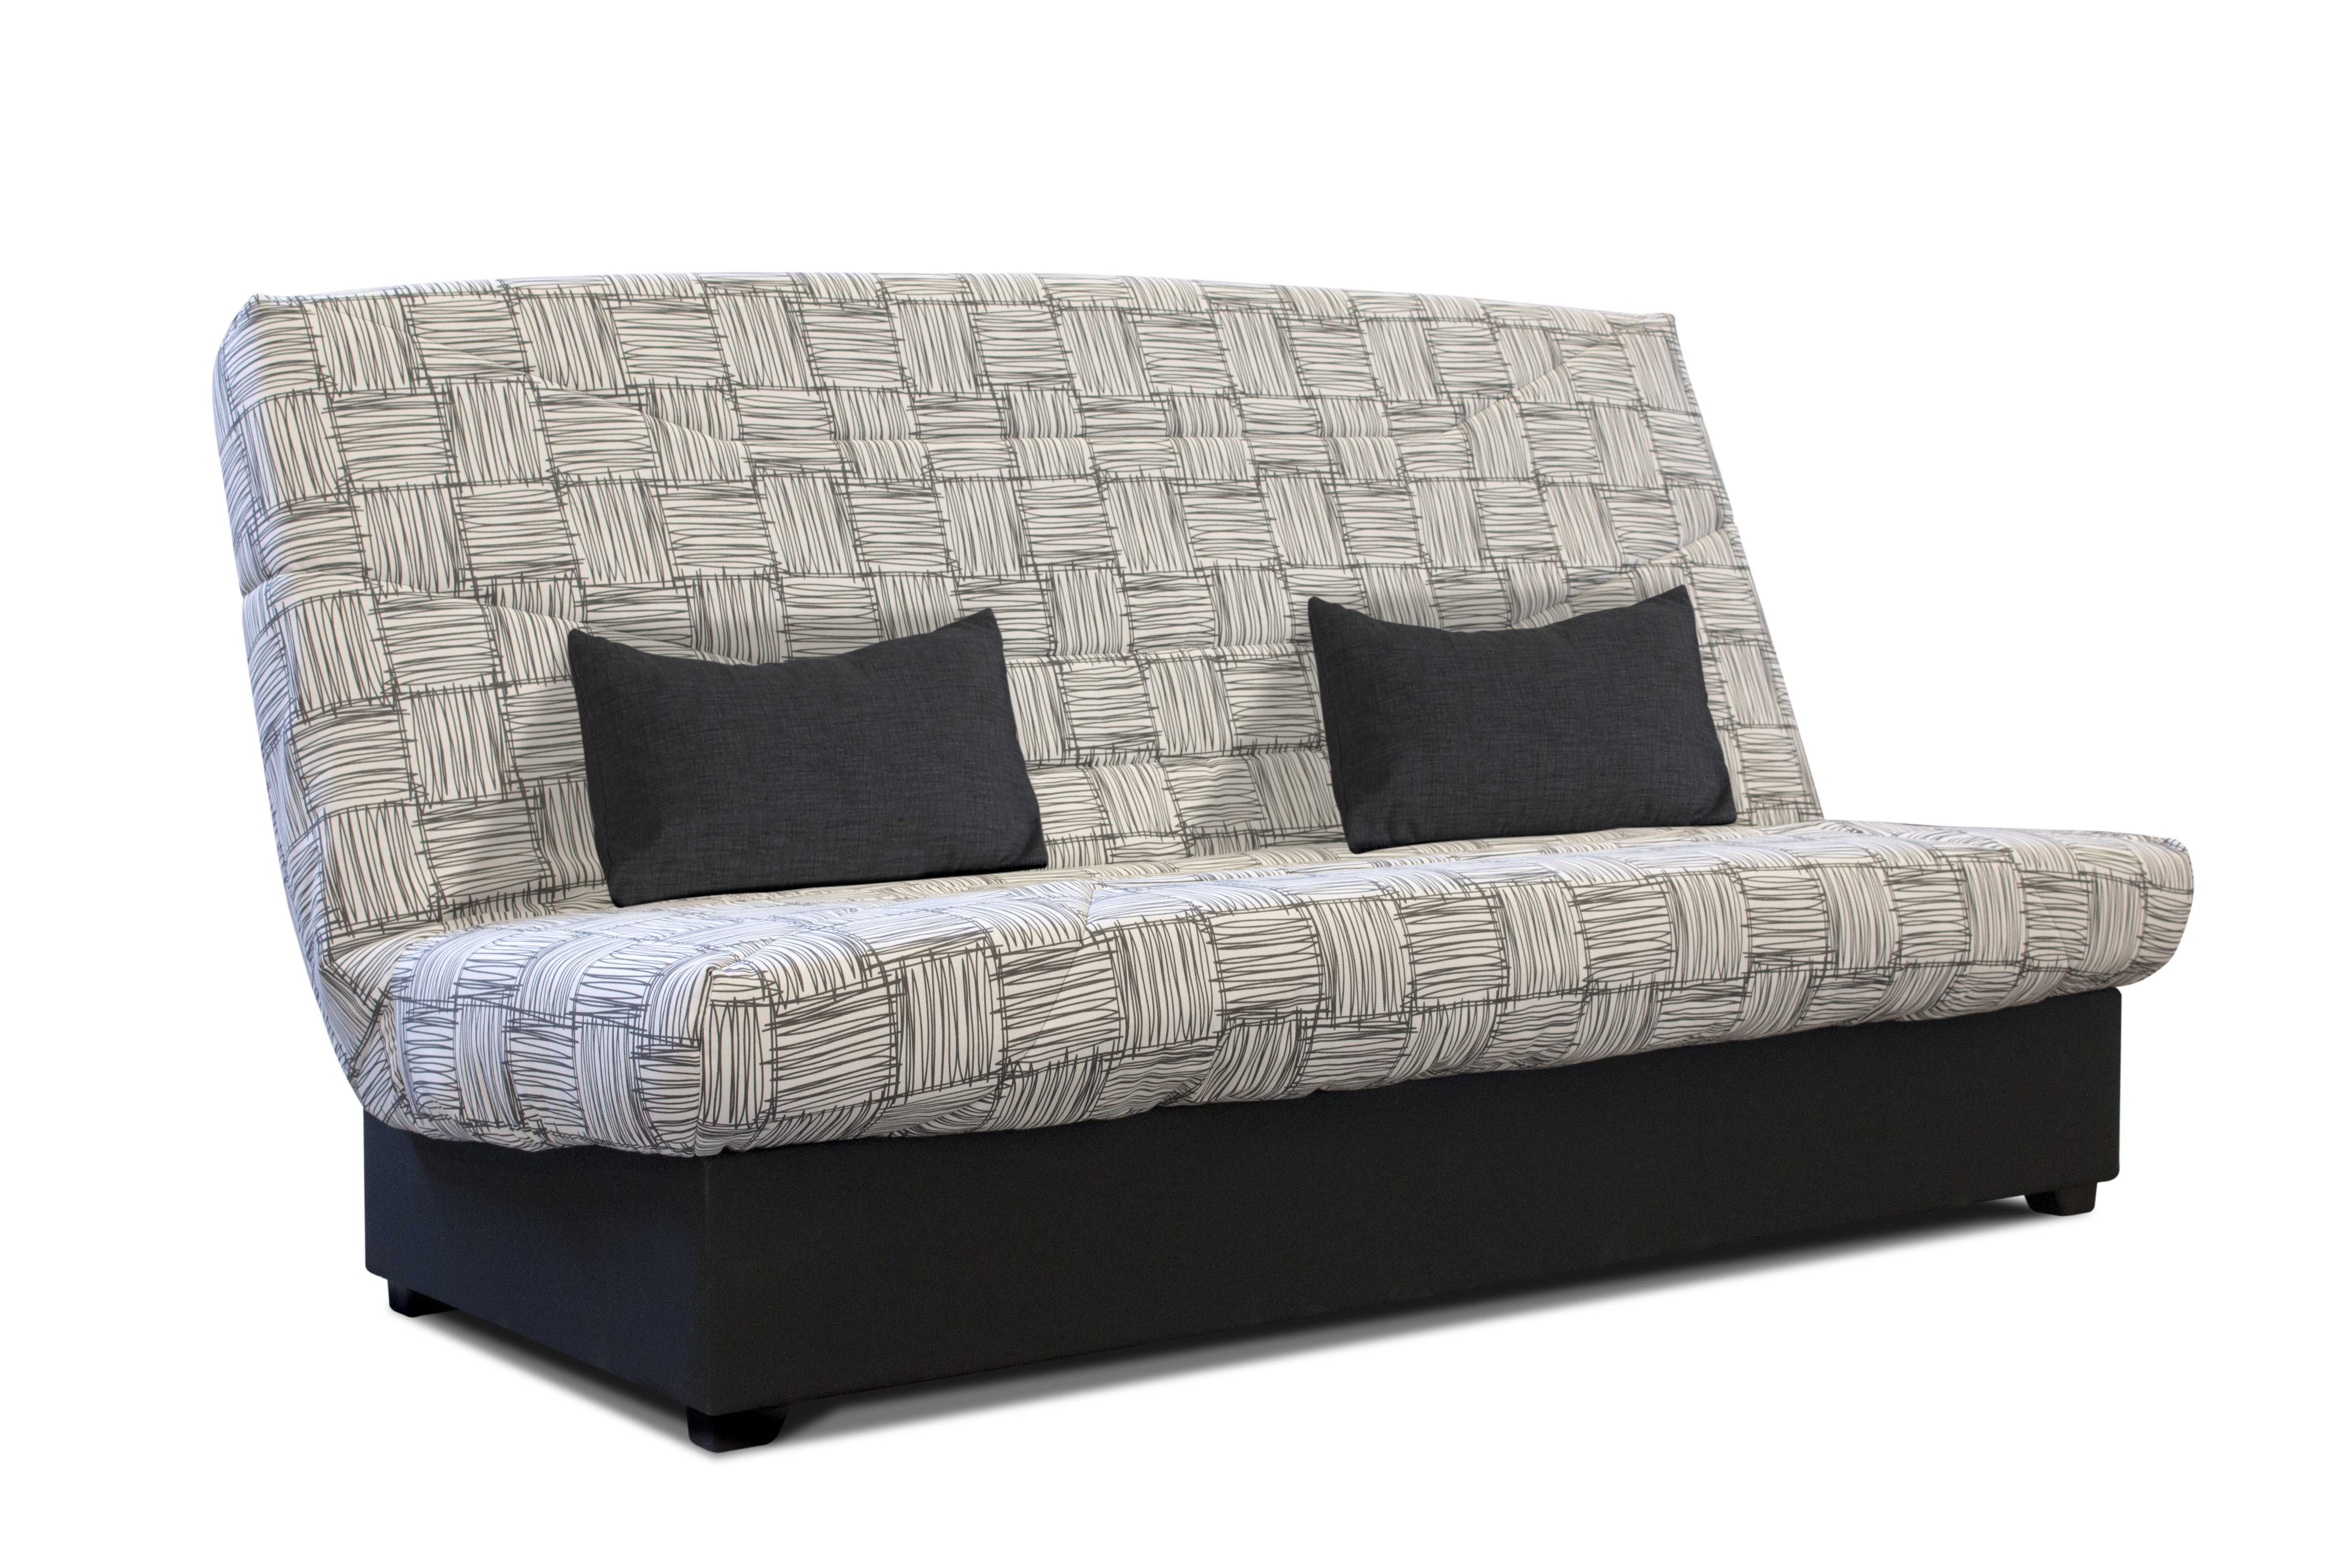 Sofás cama baratos online prar sofá cama